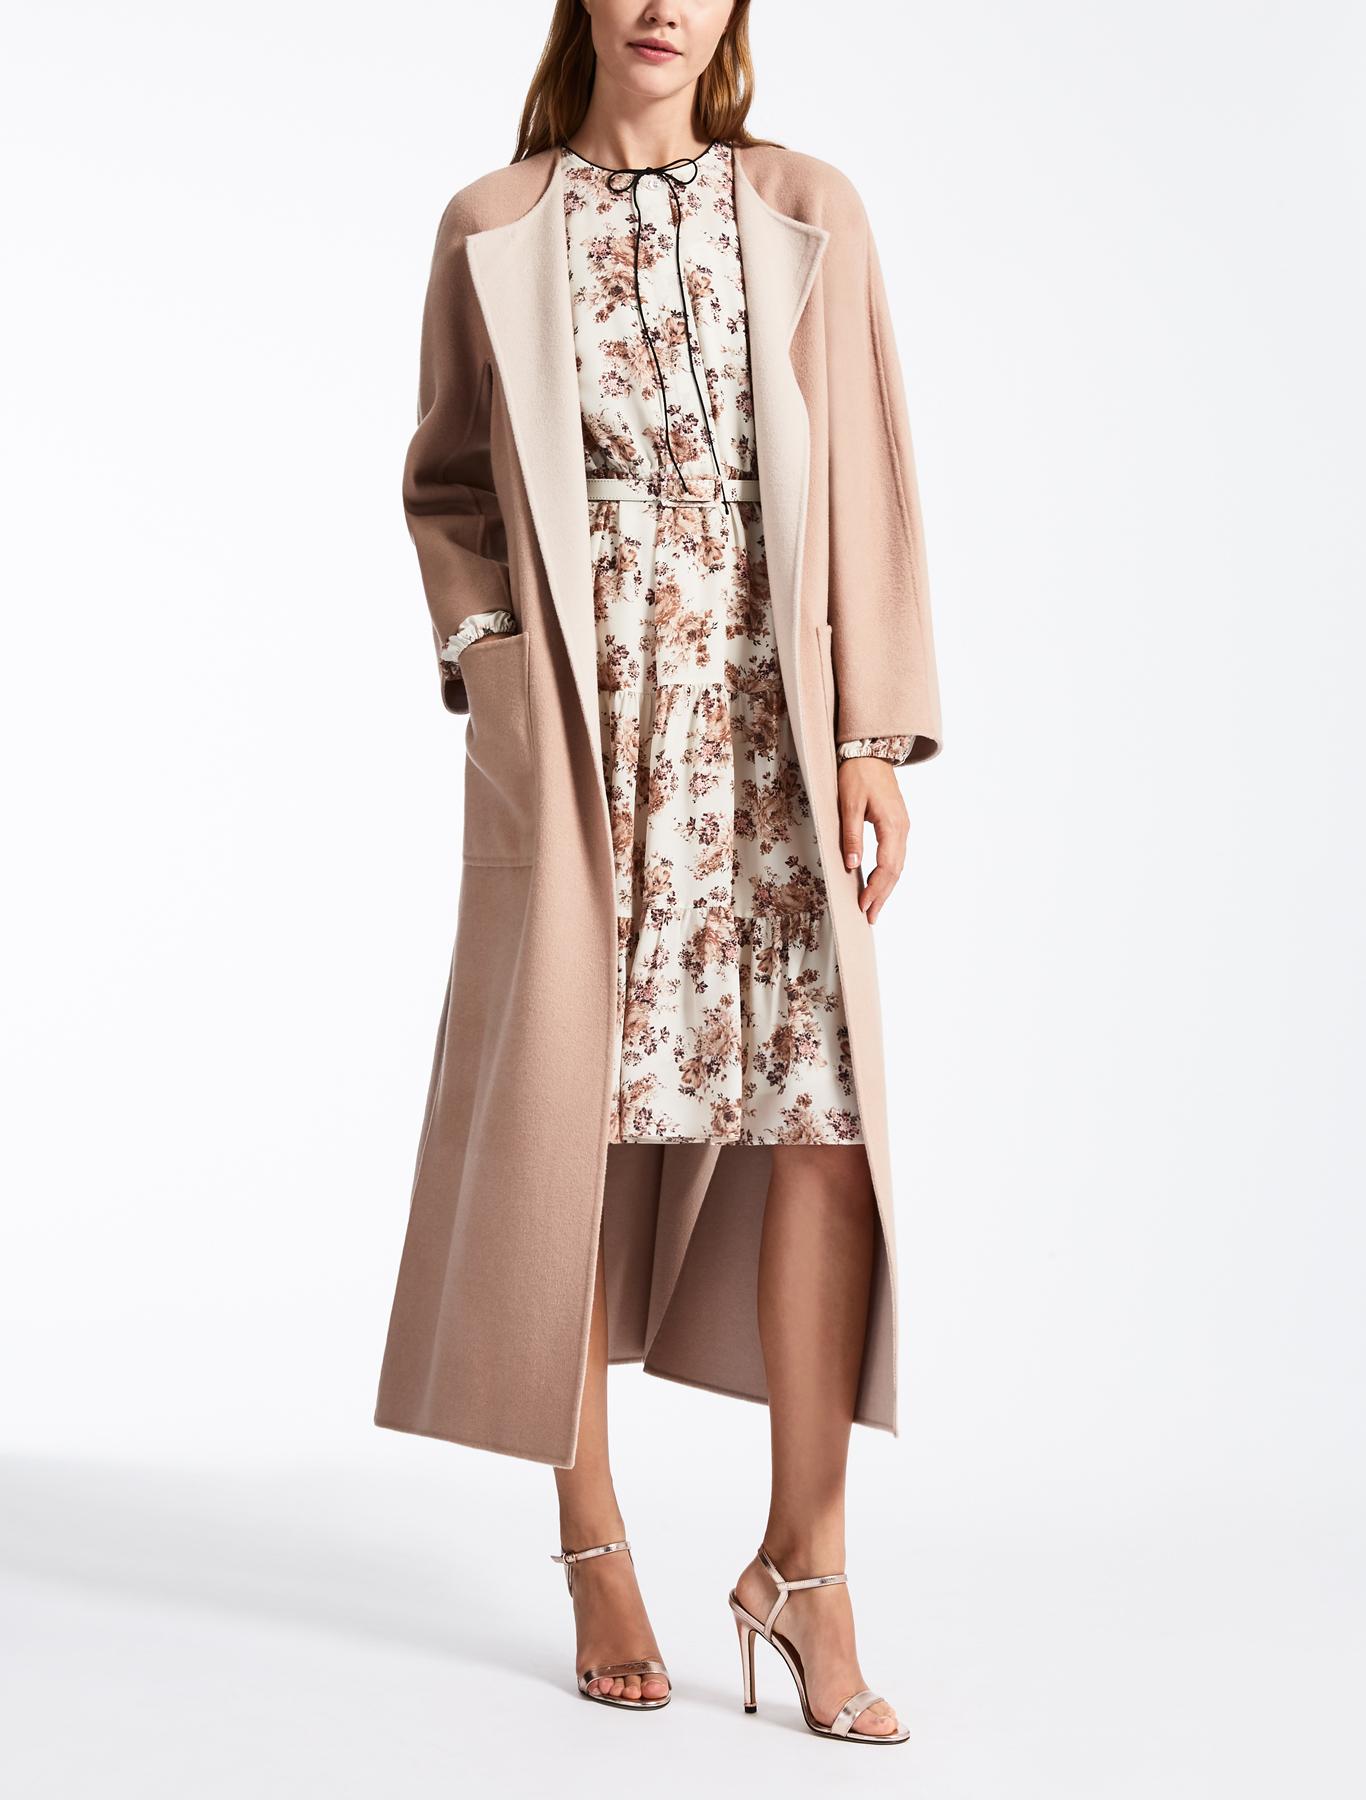 Макс Мара Женская Одежда Пальто